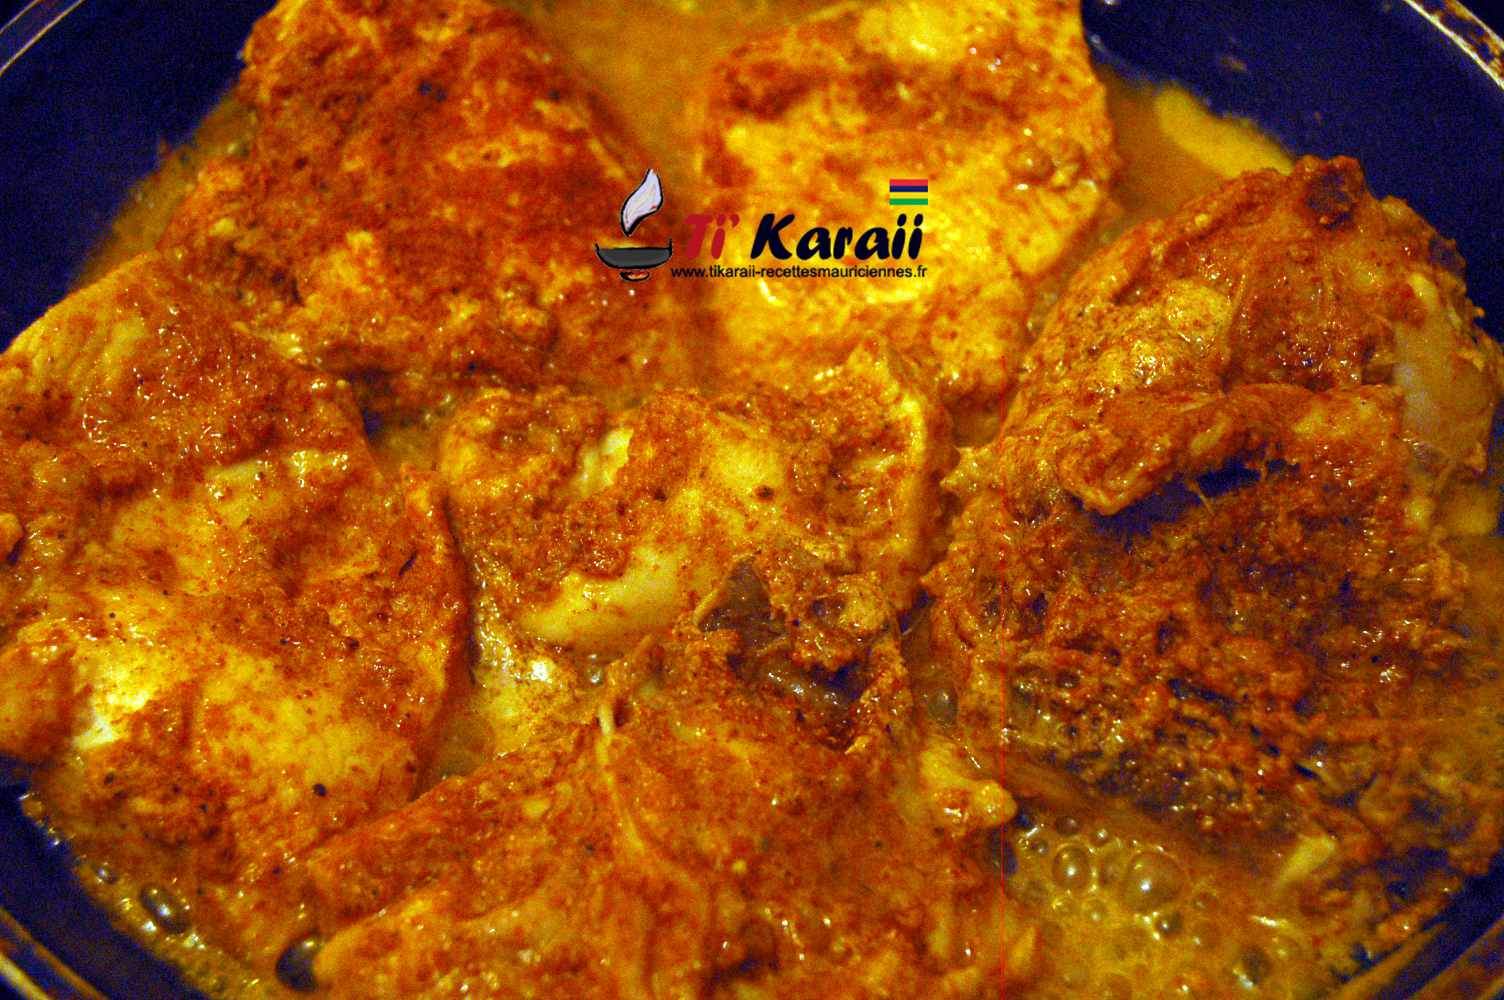 poulet tandoori recette sans colorant ti karaii. Black Bedroom Furniture Sets. Home Design Ideas